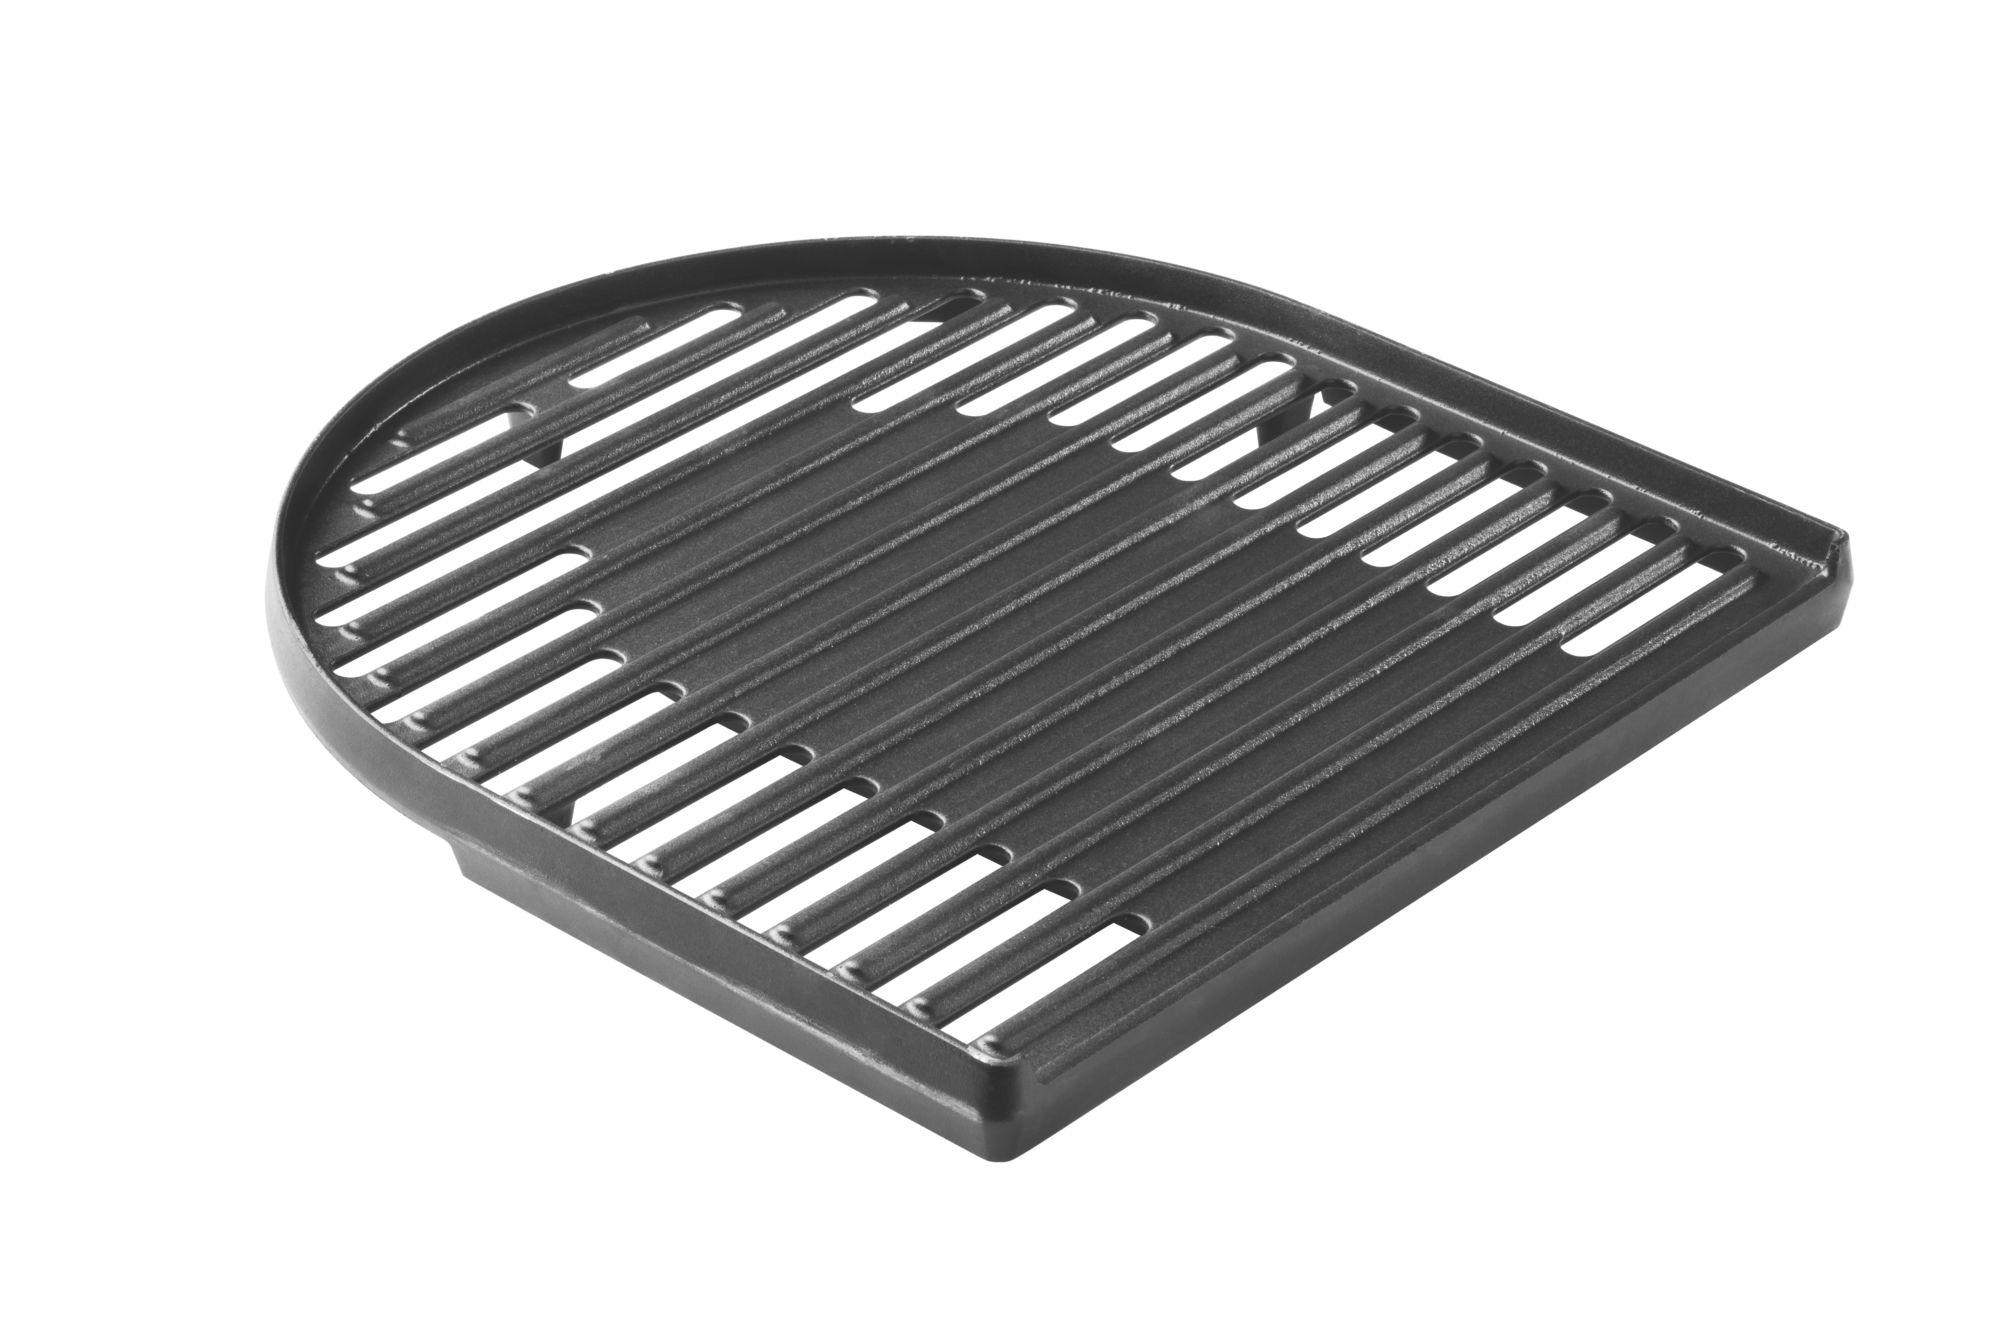 coleman roadtrip cast iron grill grate